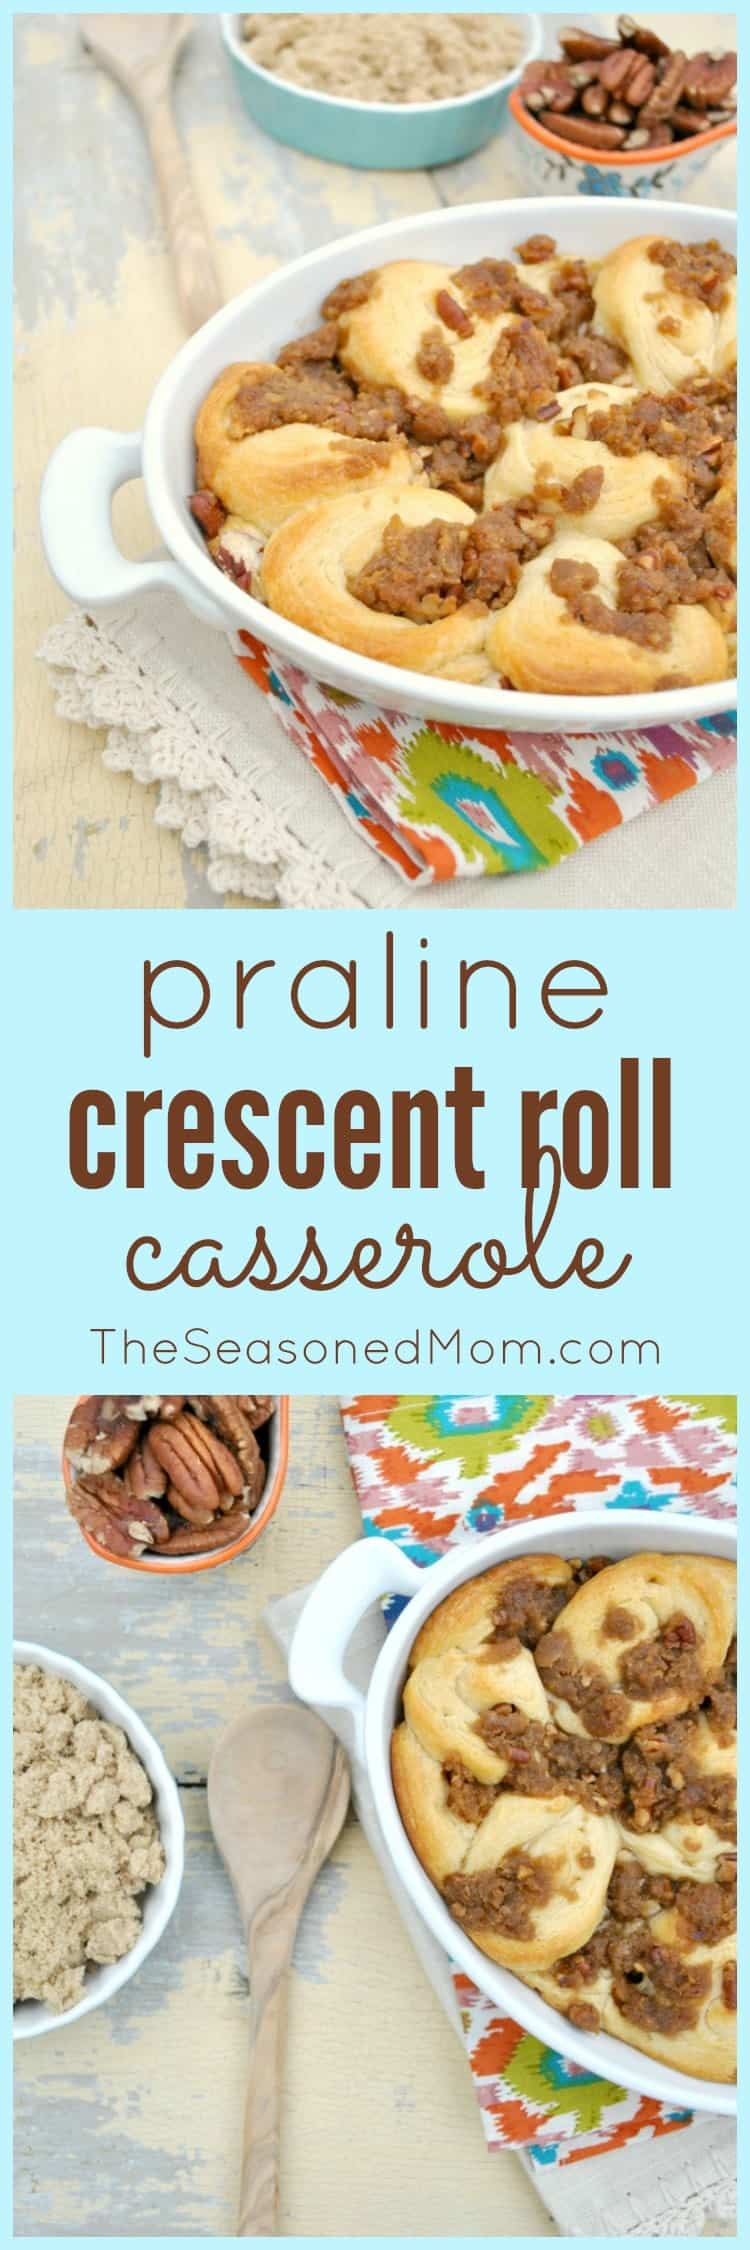 Praline Crescent Roll Casserole